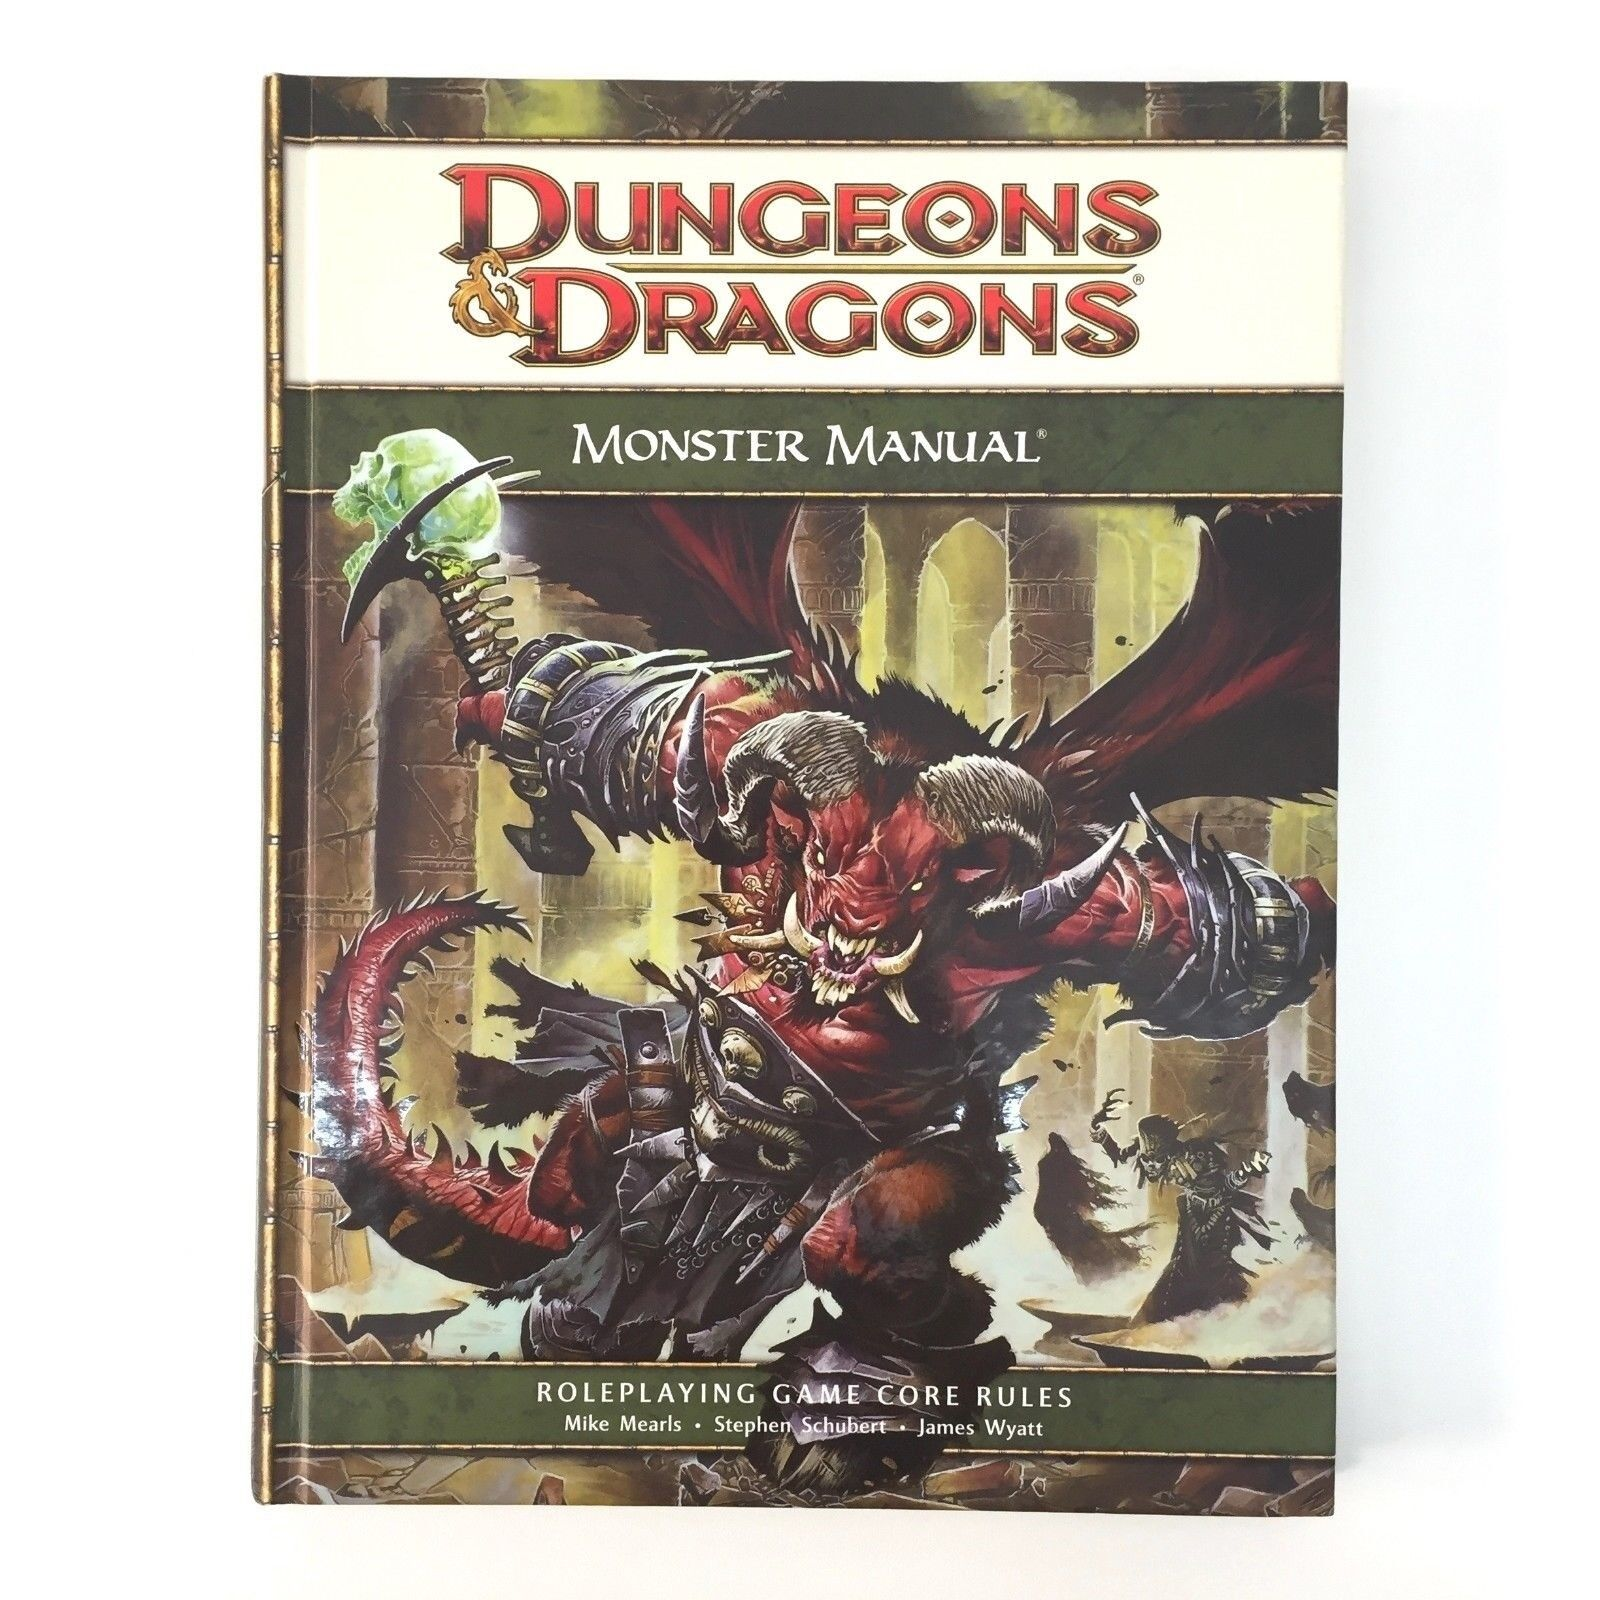 Montruo handbuch calabozos y dragones tapa dura magos rpg d20 wotc tsr rpg